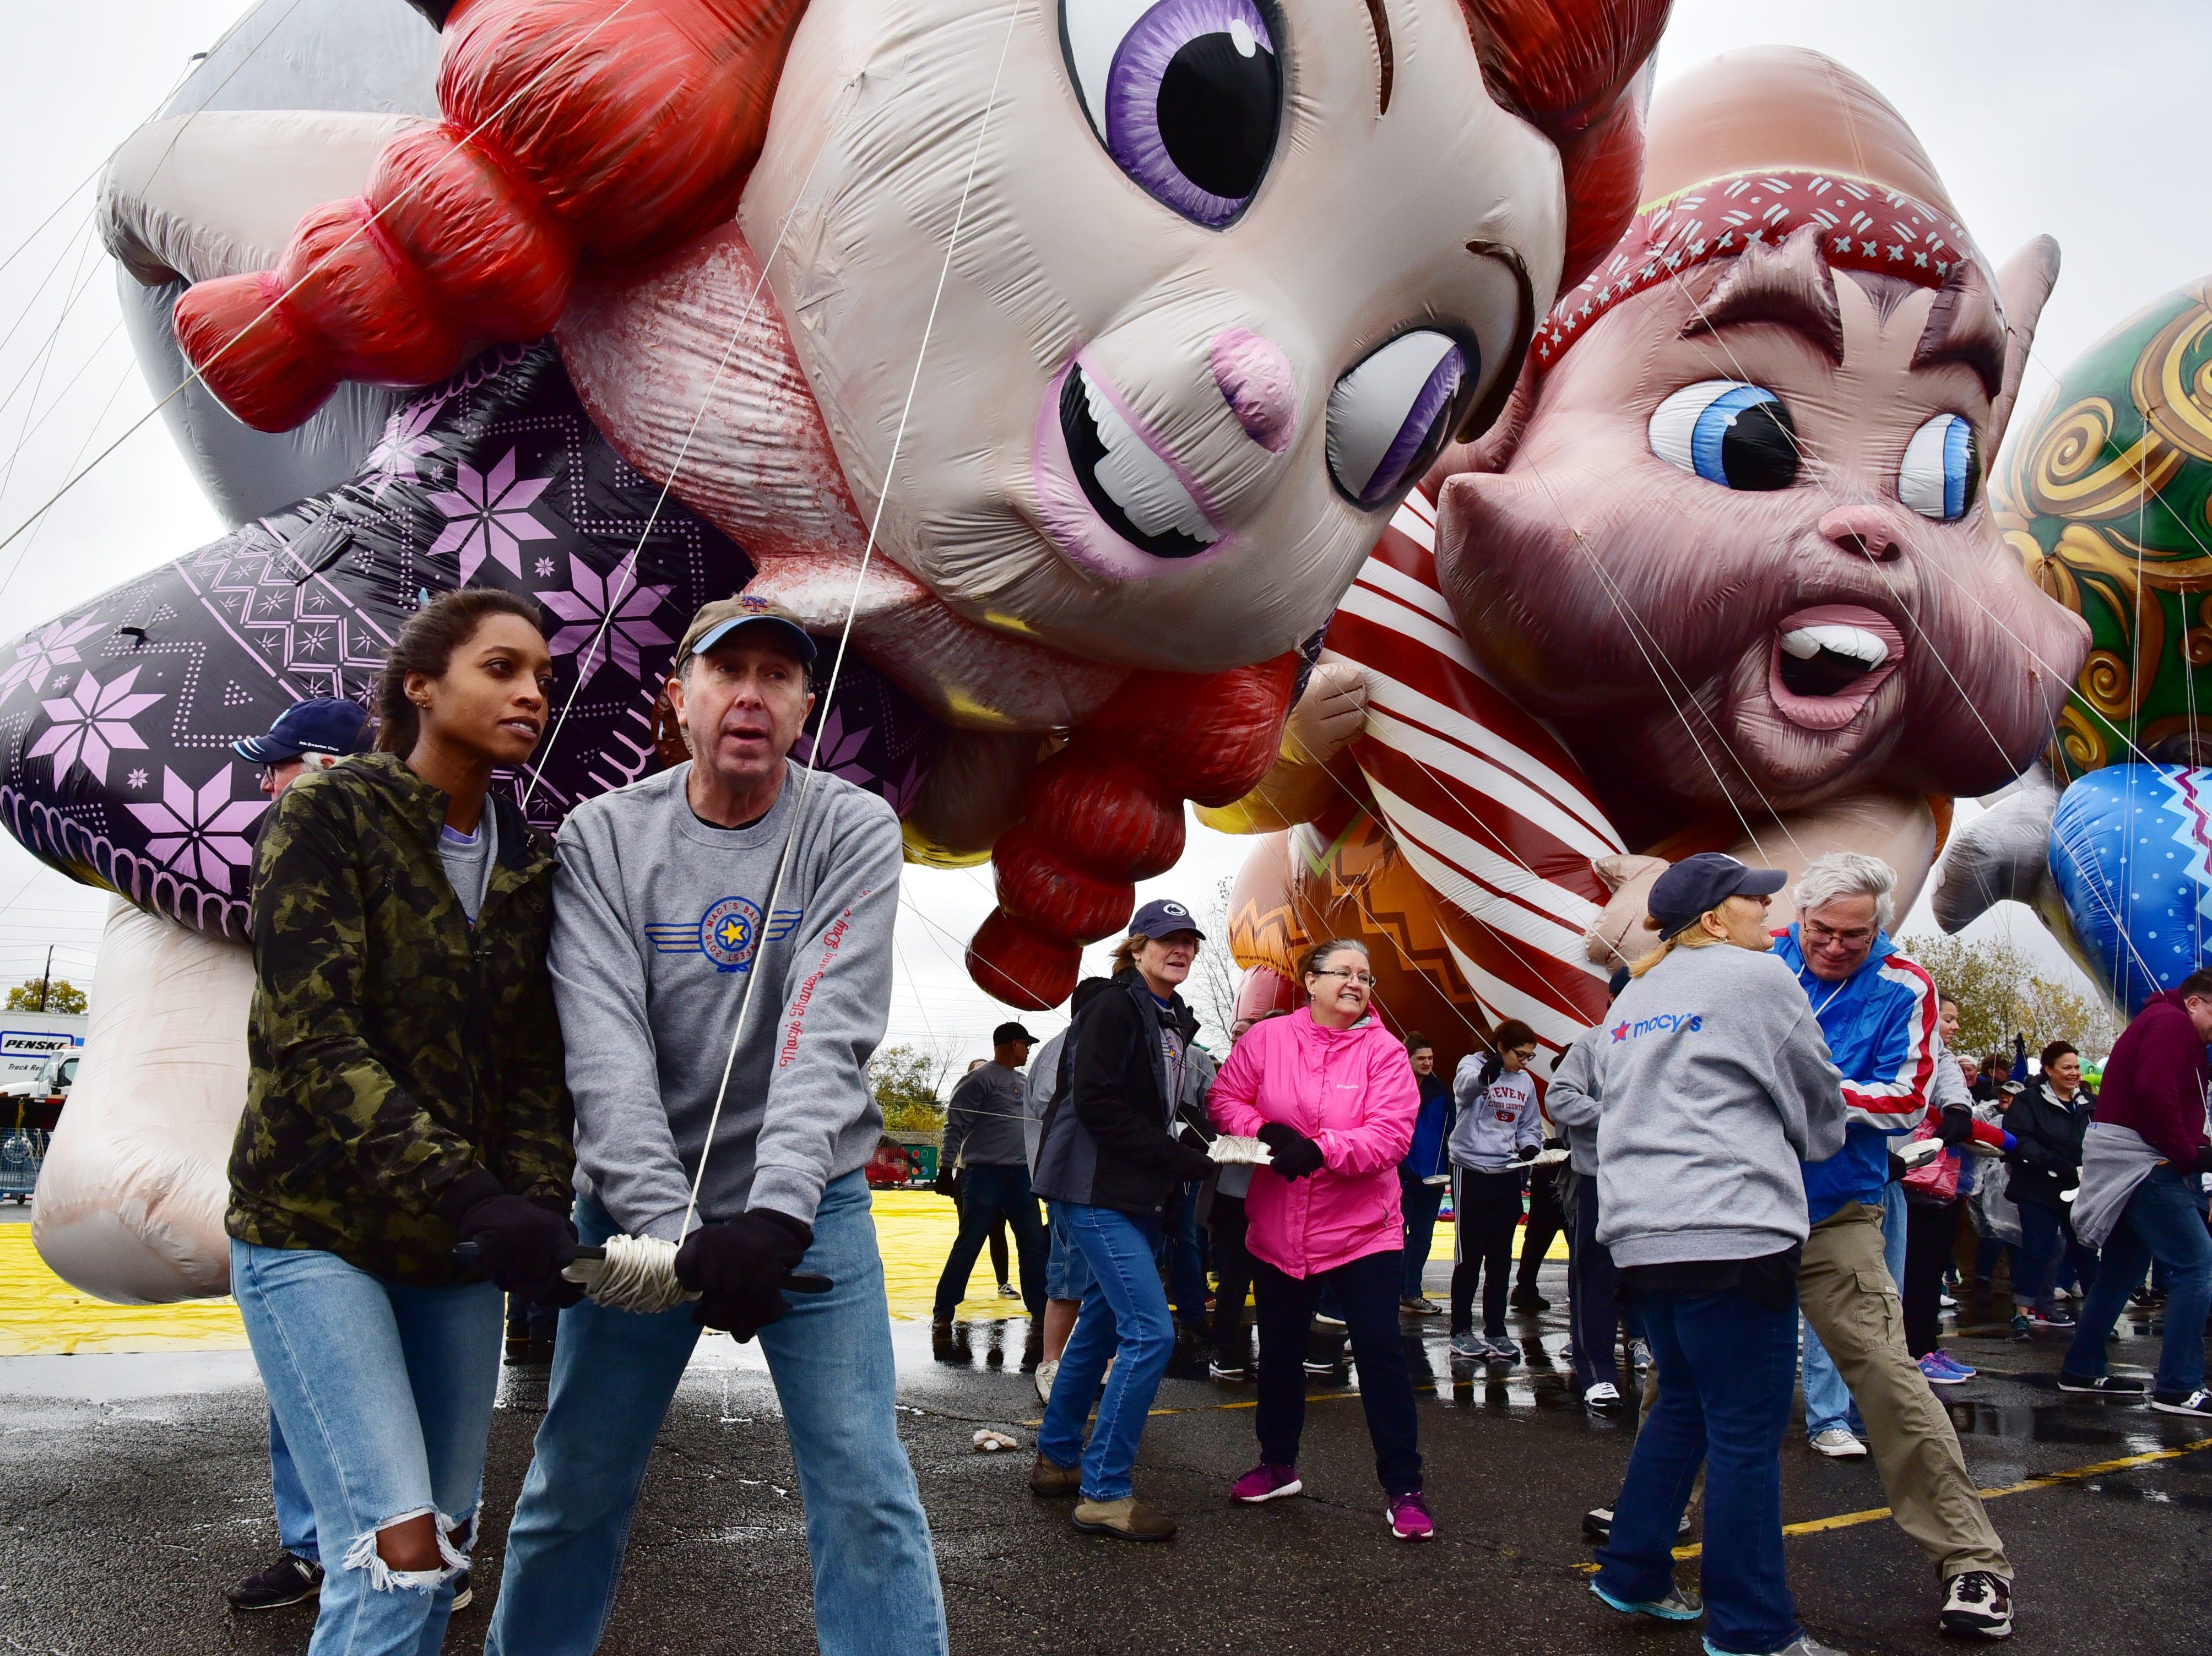 Volunteers Zuki Wilson and Steve Simon, test fly Fleck, Bjorn and Jojo, the newest Macy's Thanksgiving Parade balloons, at MetLife Stadium parking lot on Saturday, November 3.